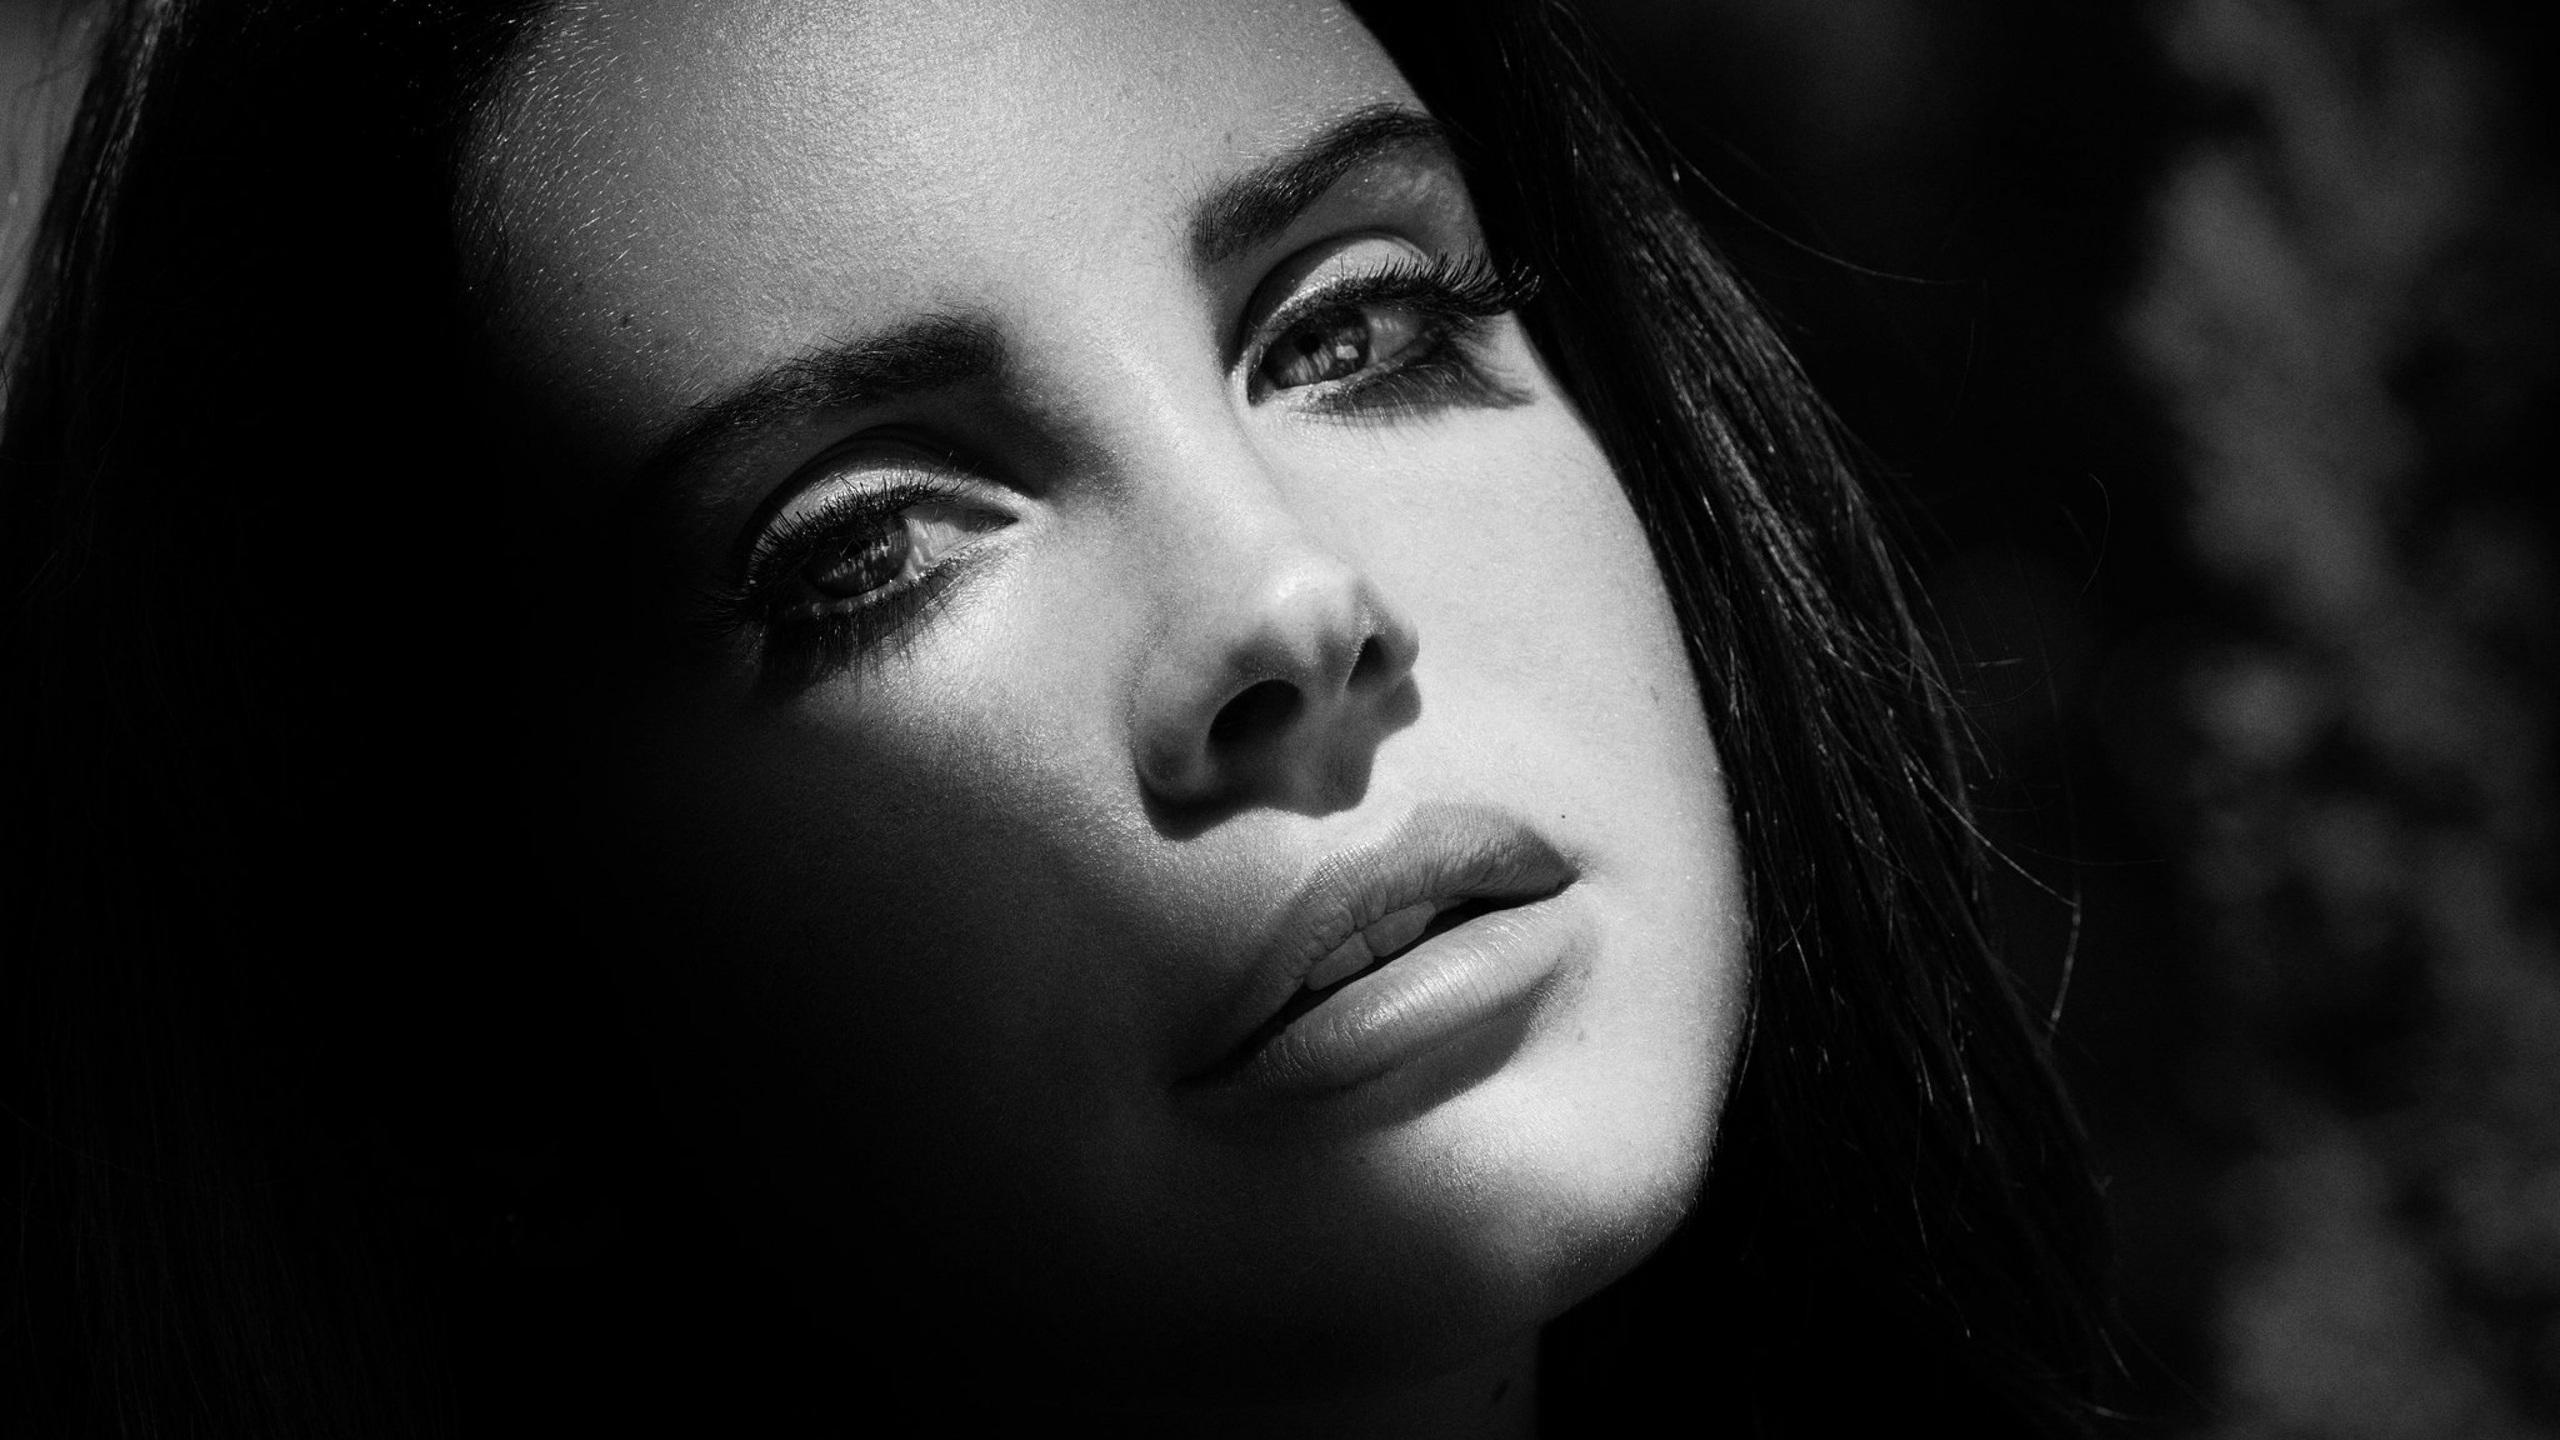 2560x1440 Lana Del Rey Monochrome 1440p Resolution Hd 4k Wallpapers